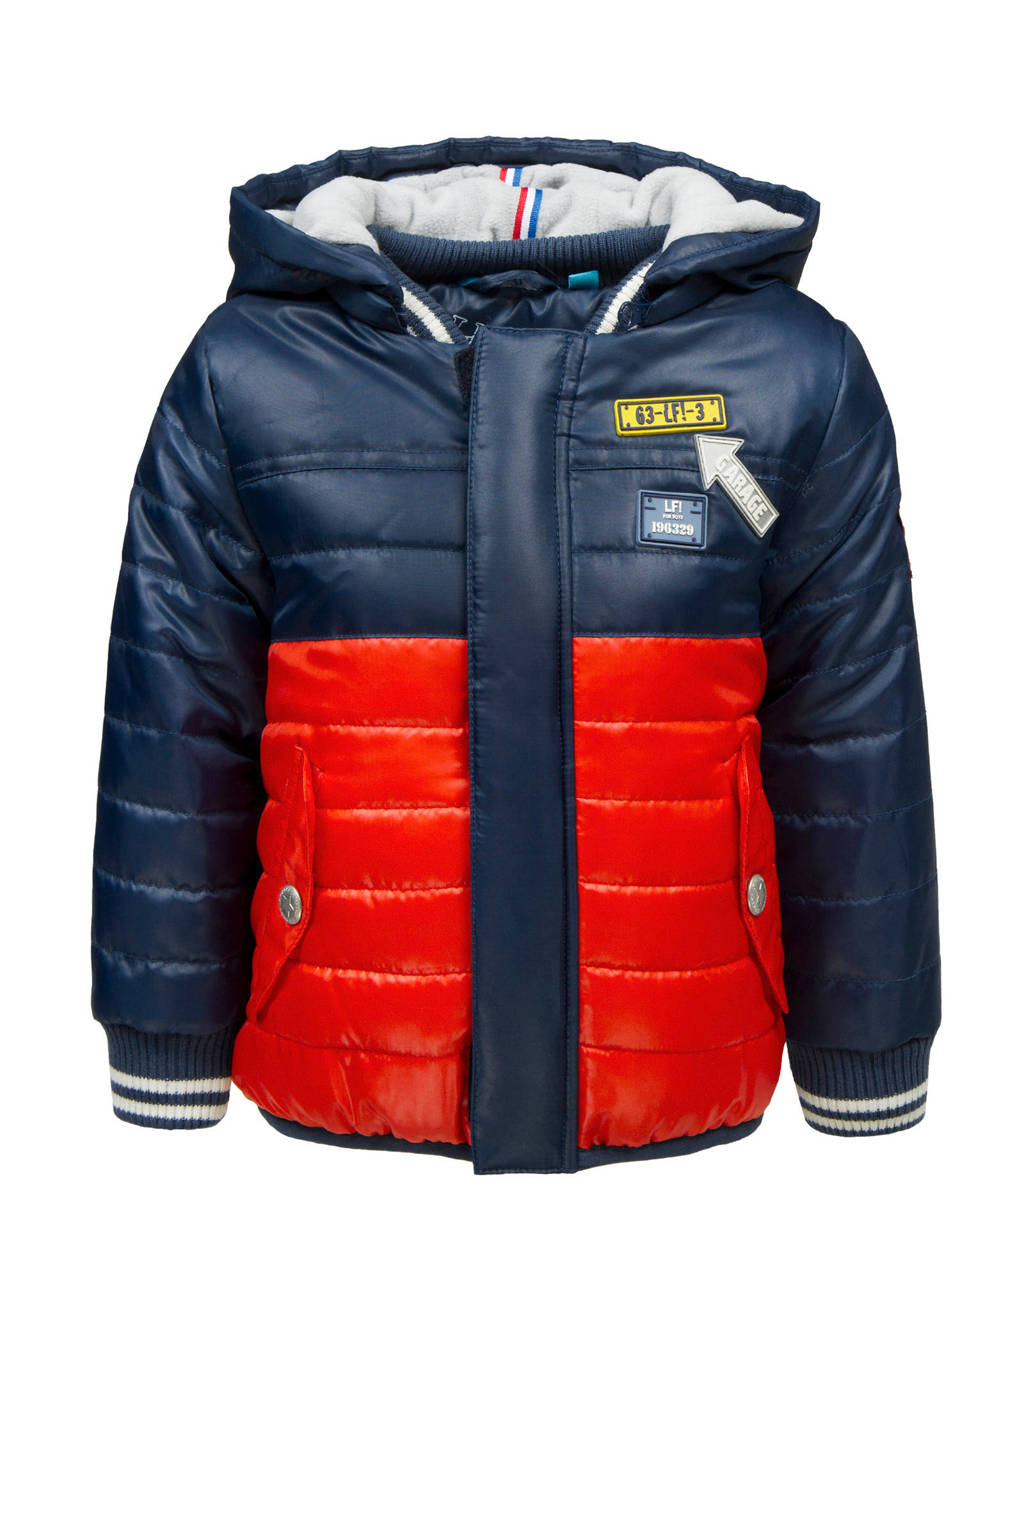 lief! winterjas blauw/rood, Donkerblauw/rood